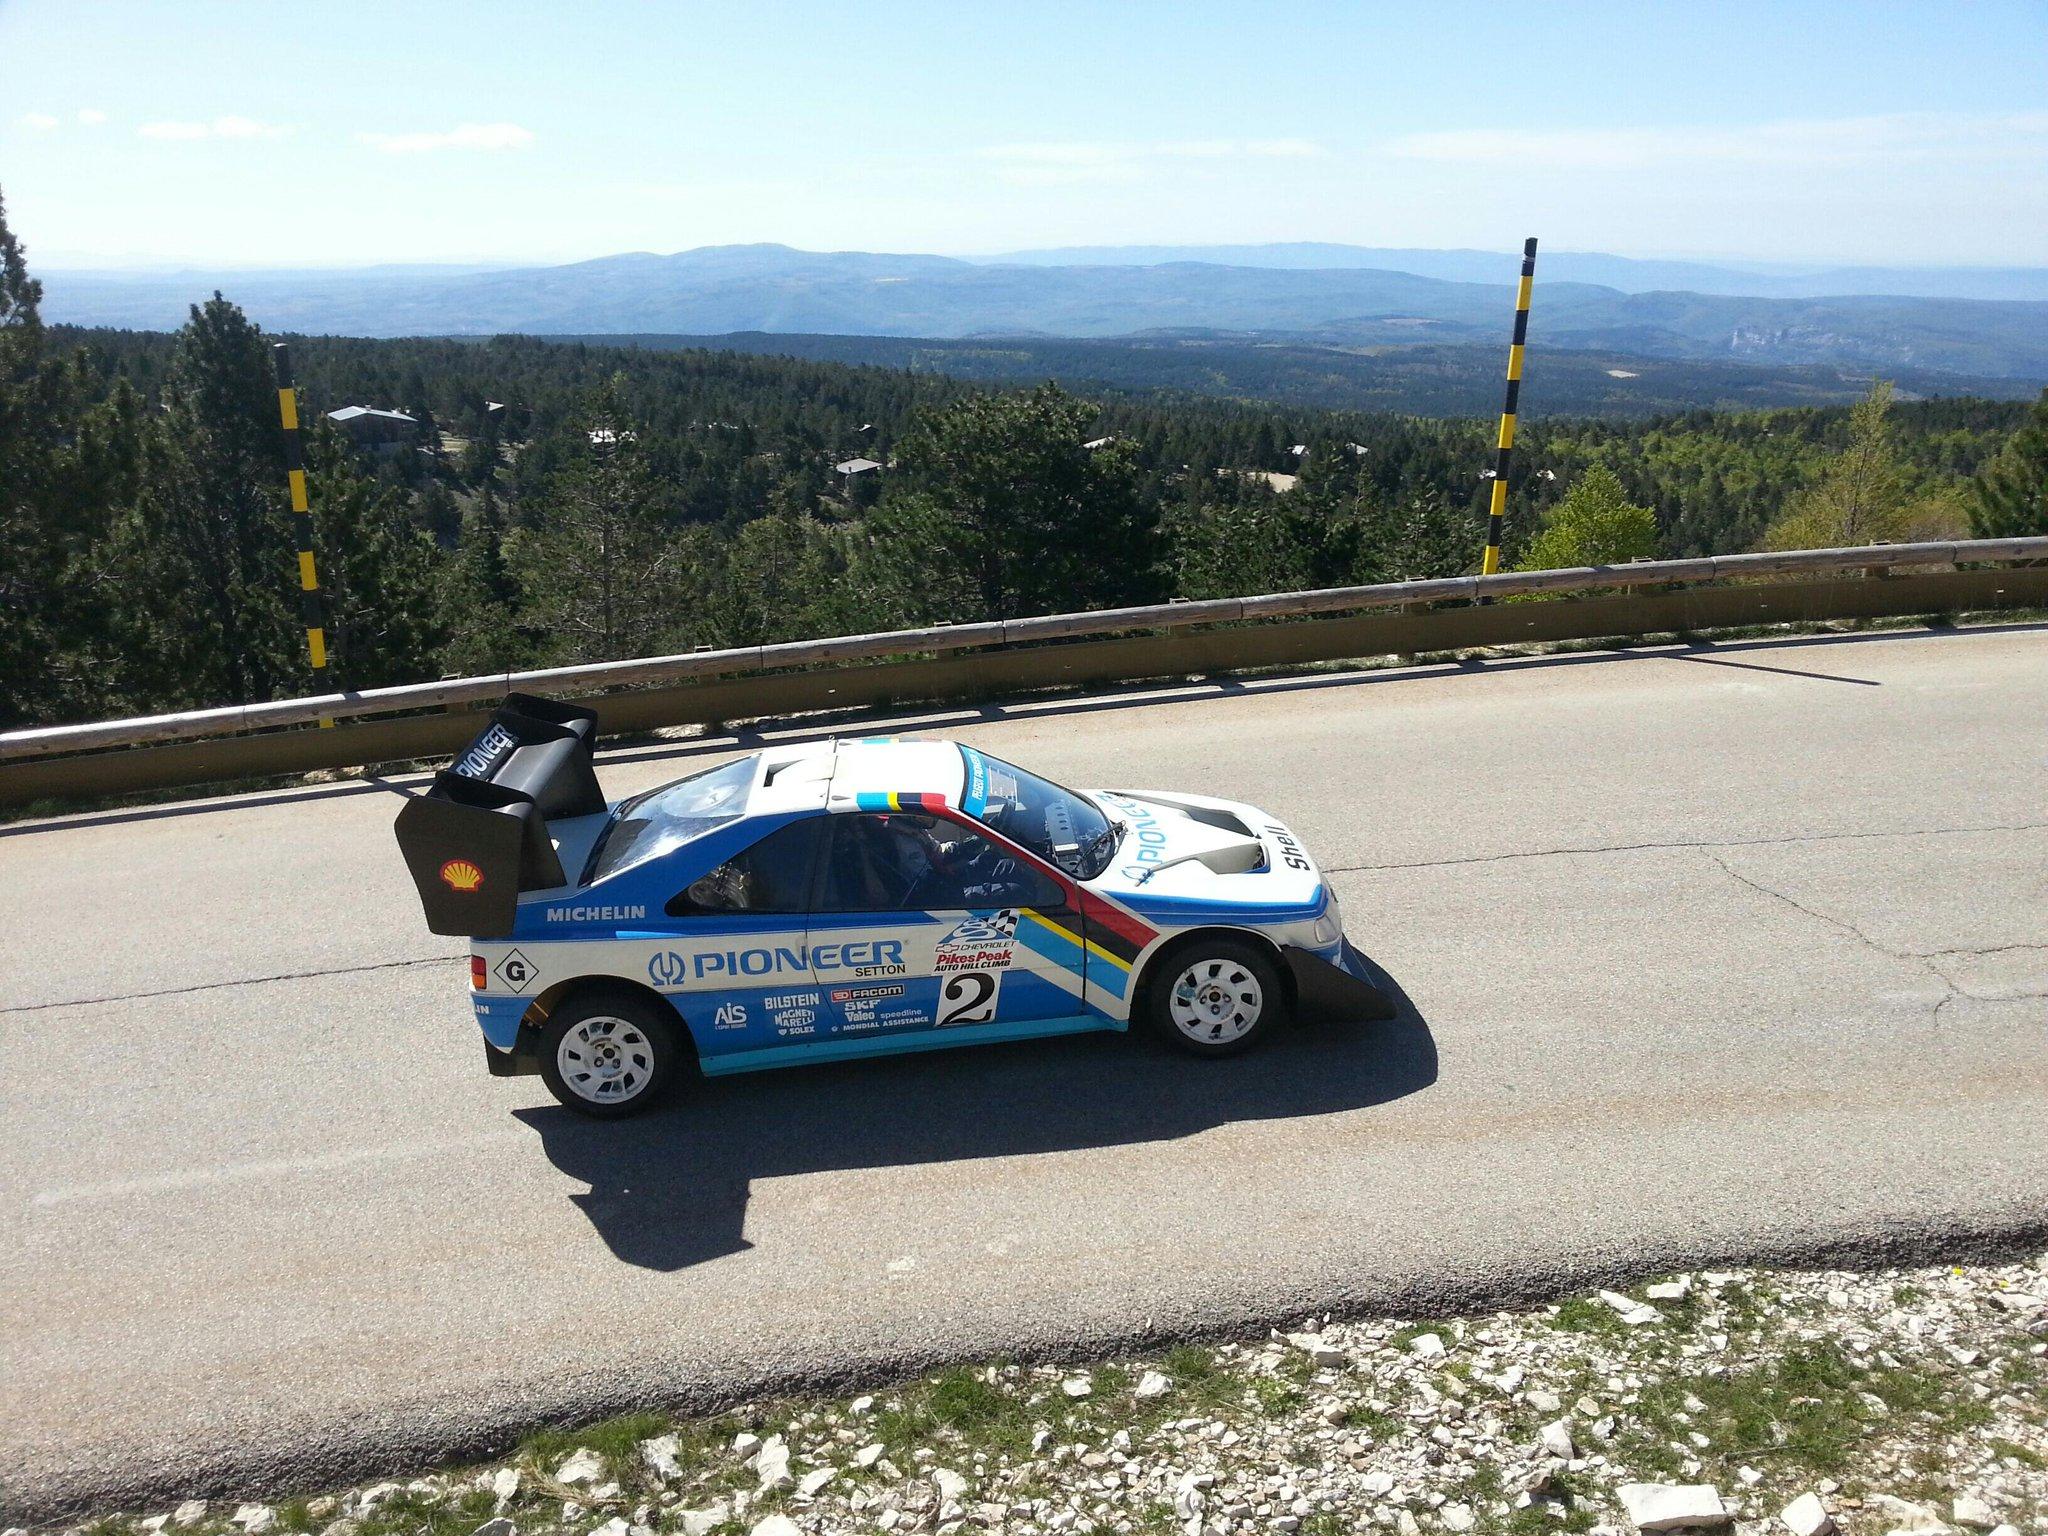 RT @legranddanton: #Peugeot #405T16 #Ventoux #Loeb #PikesPeak http://t.co/C9yQLDaiPF